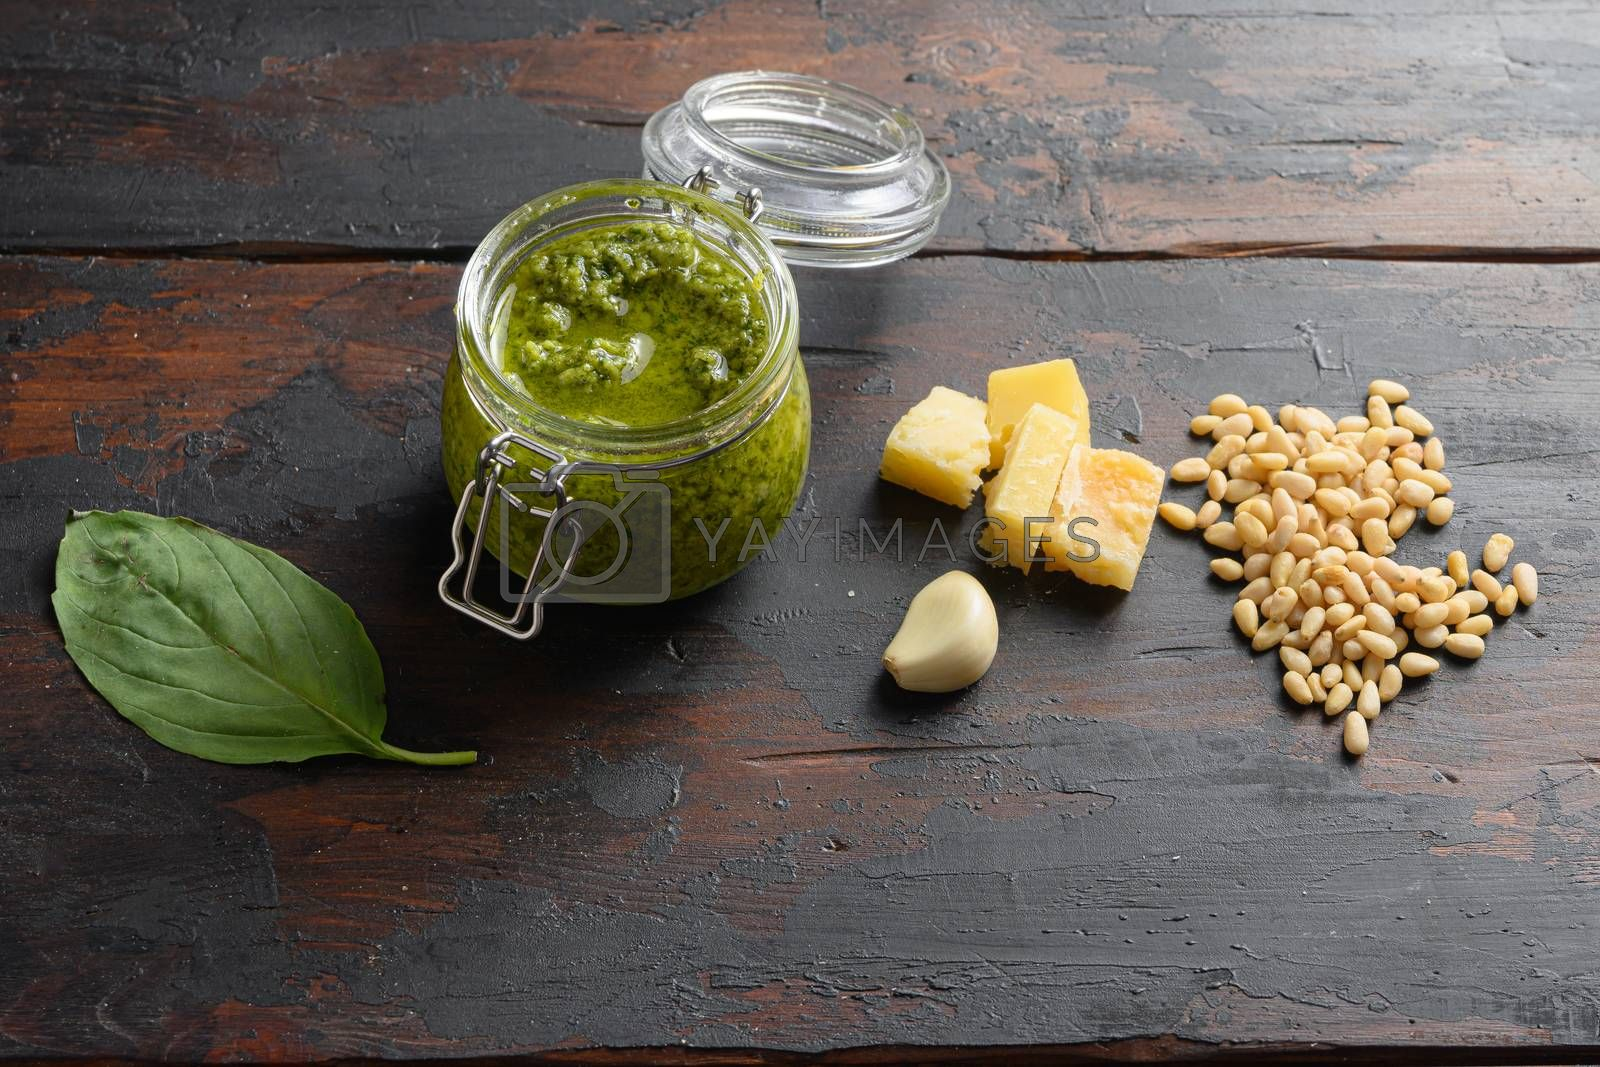 home made Pesto alla Genovese in glass jar with ingredients parmesan basil pine nuts. on dark wood table planks vintage side view.